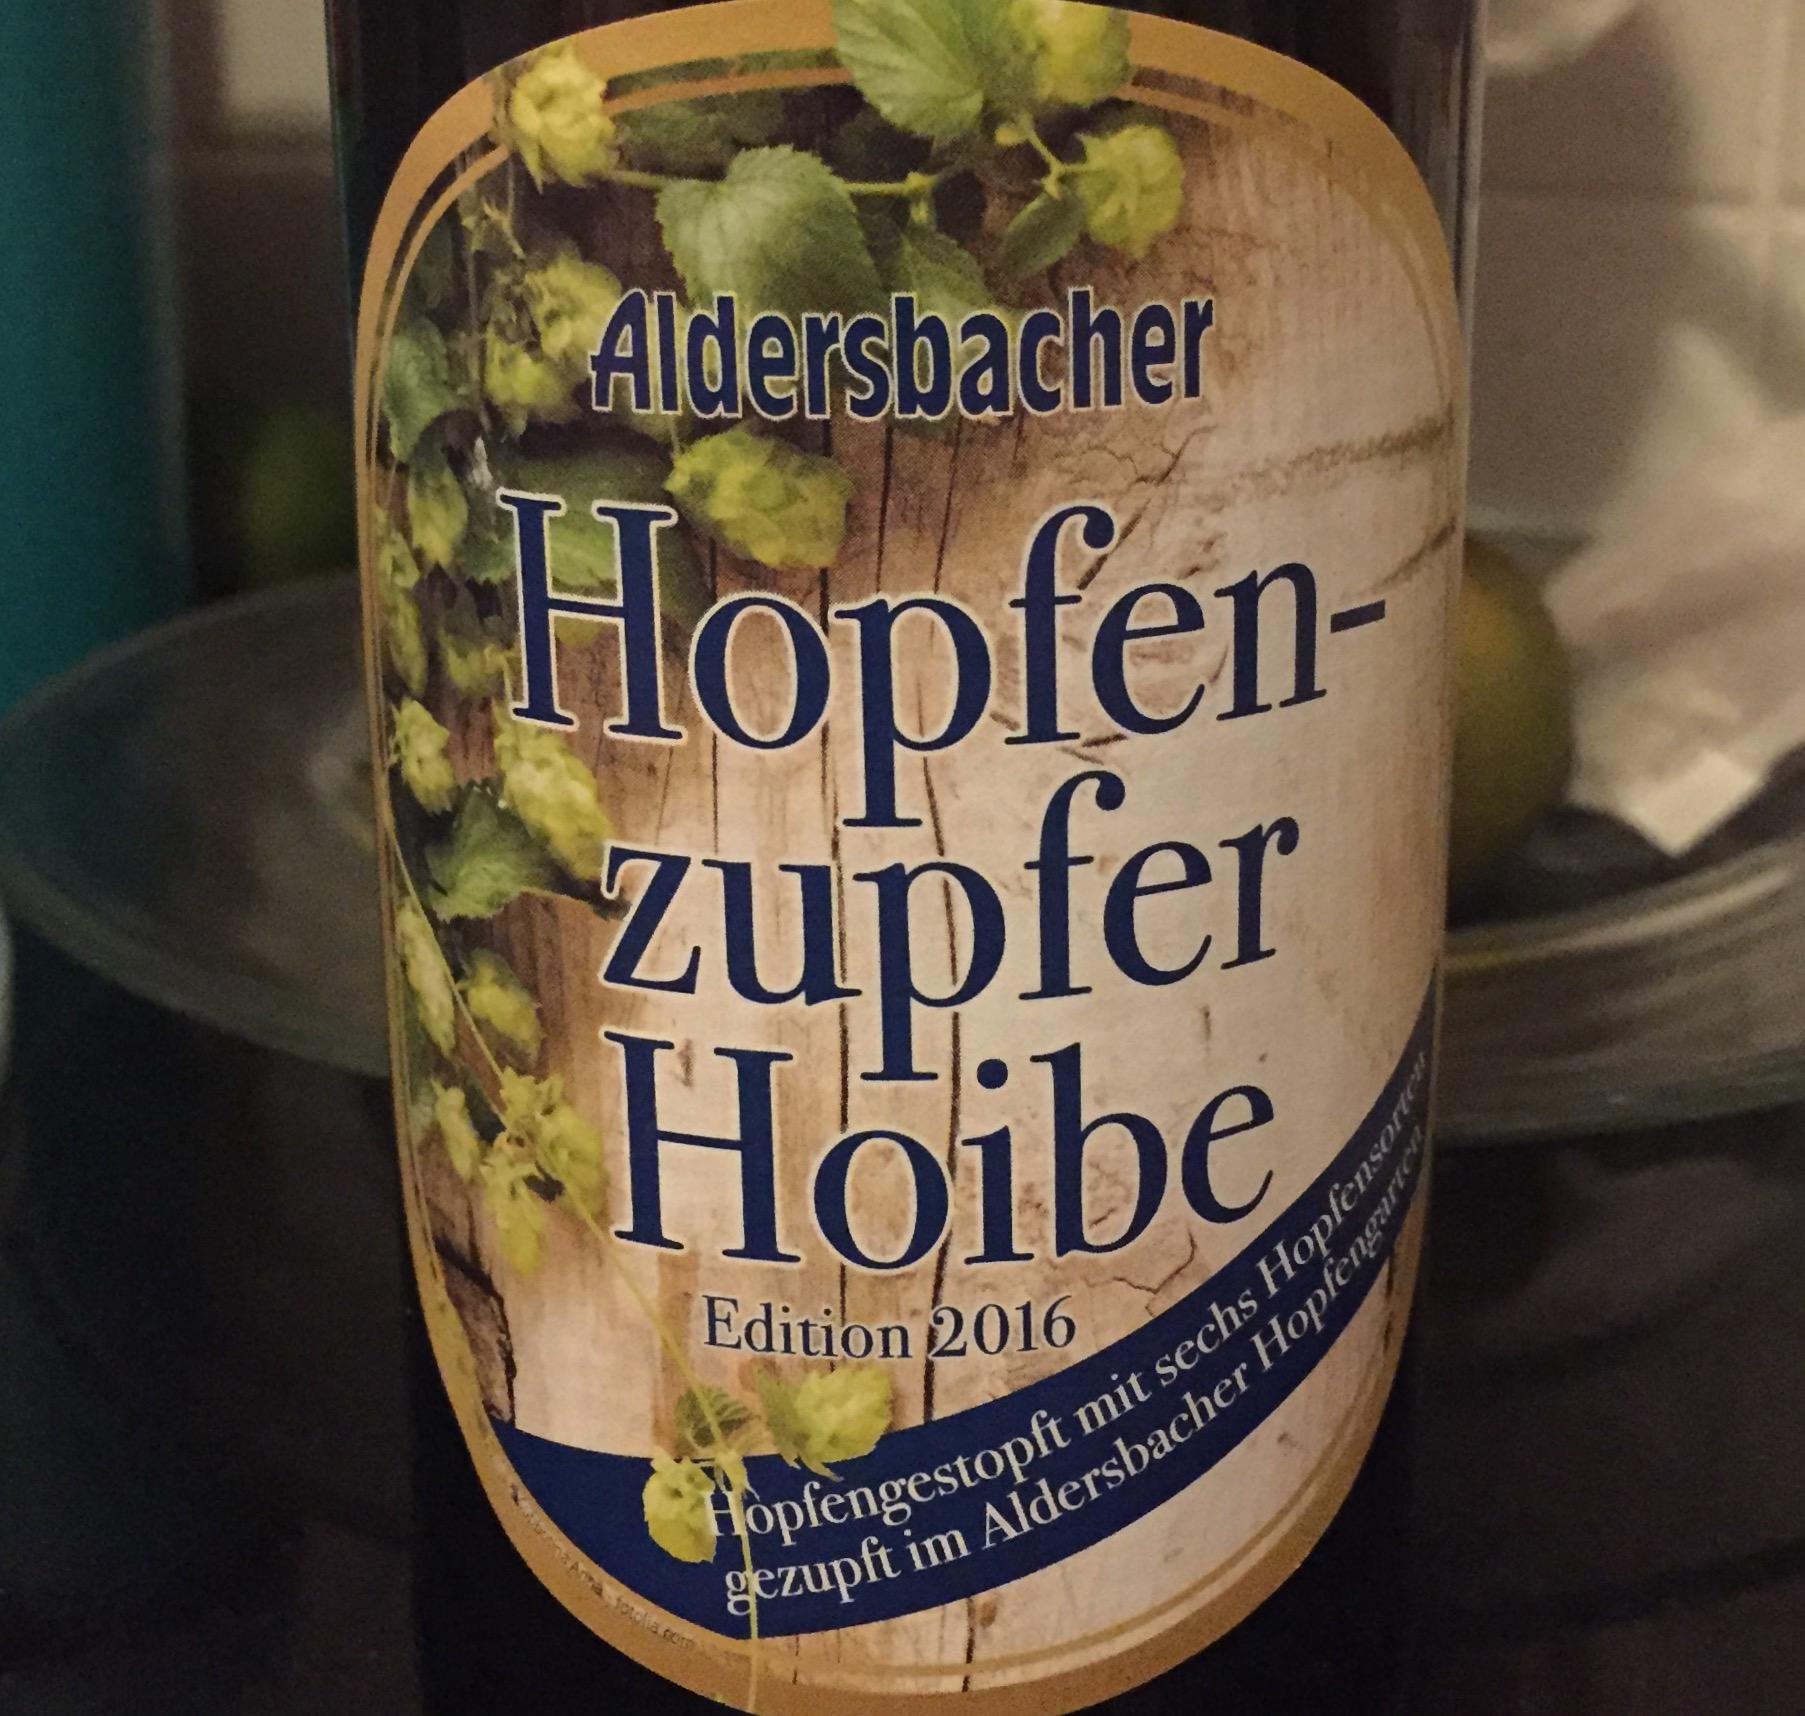 Aldersbacher - Hopfenzupfer Hoibe